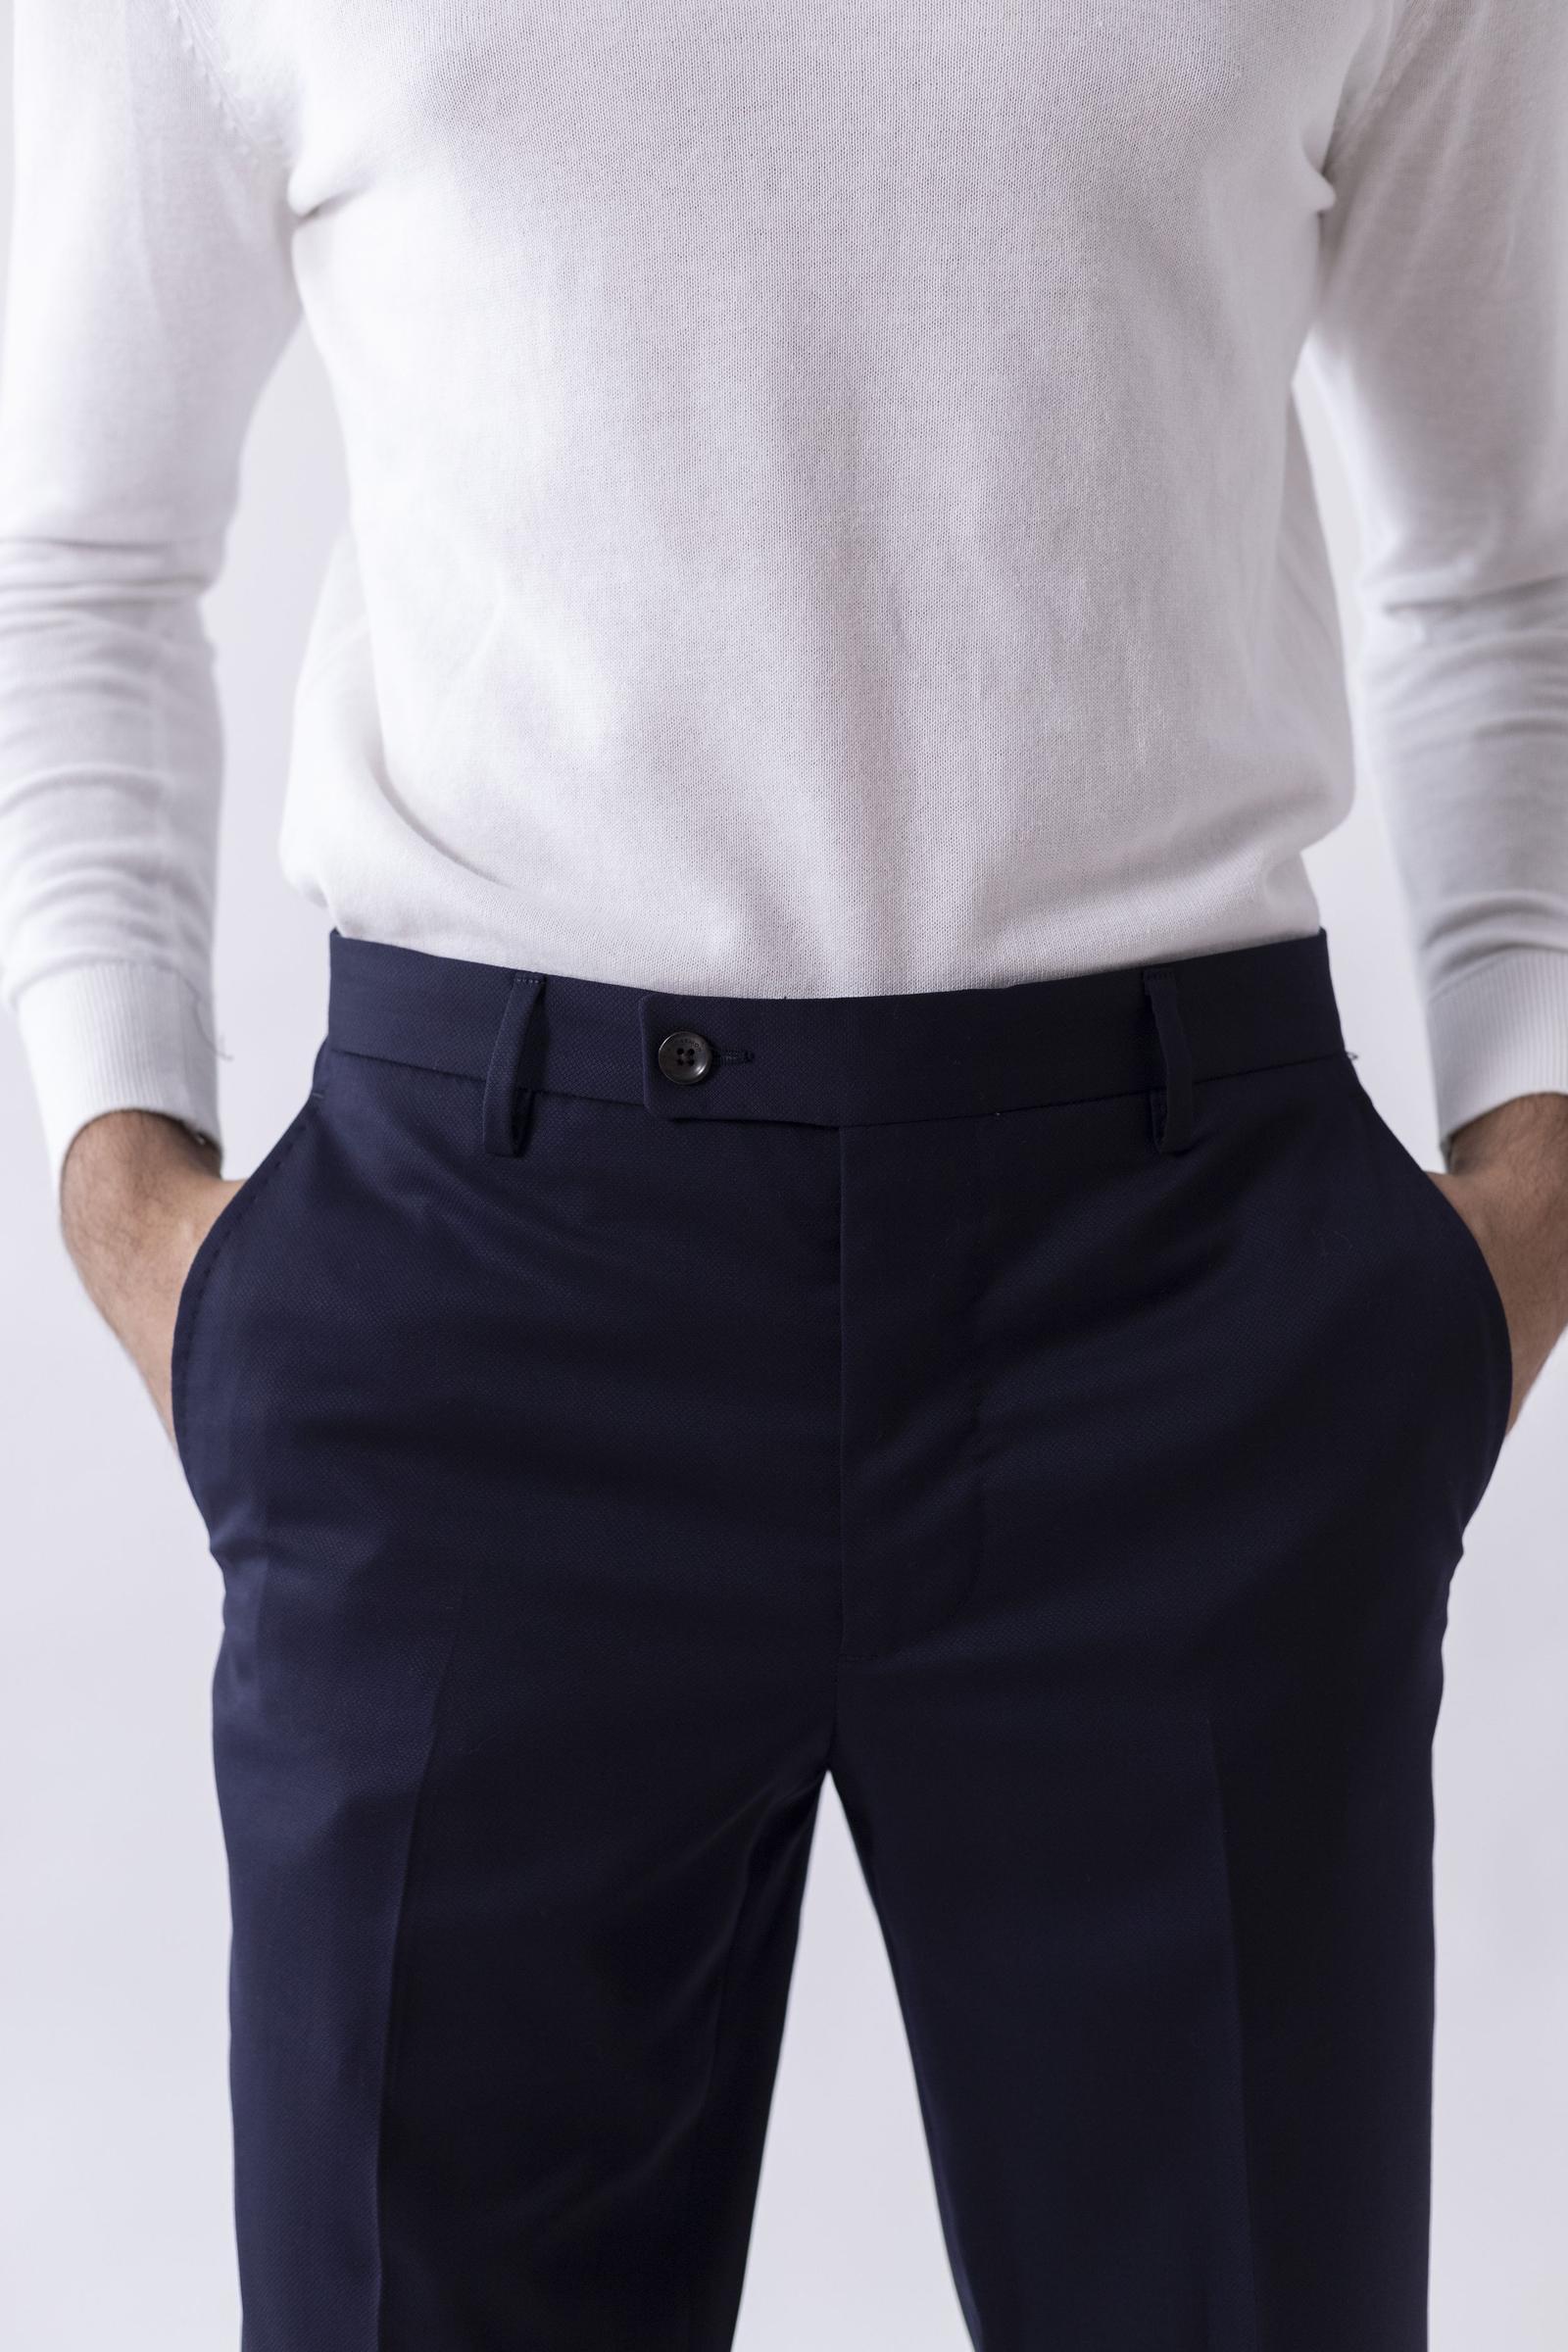 Worko Trouser - Navy Merino